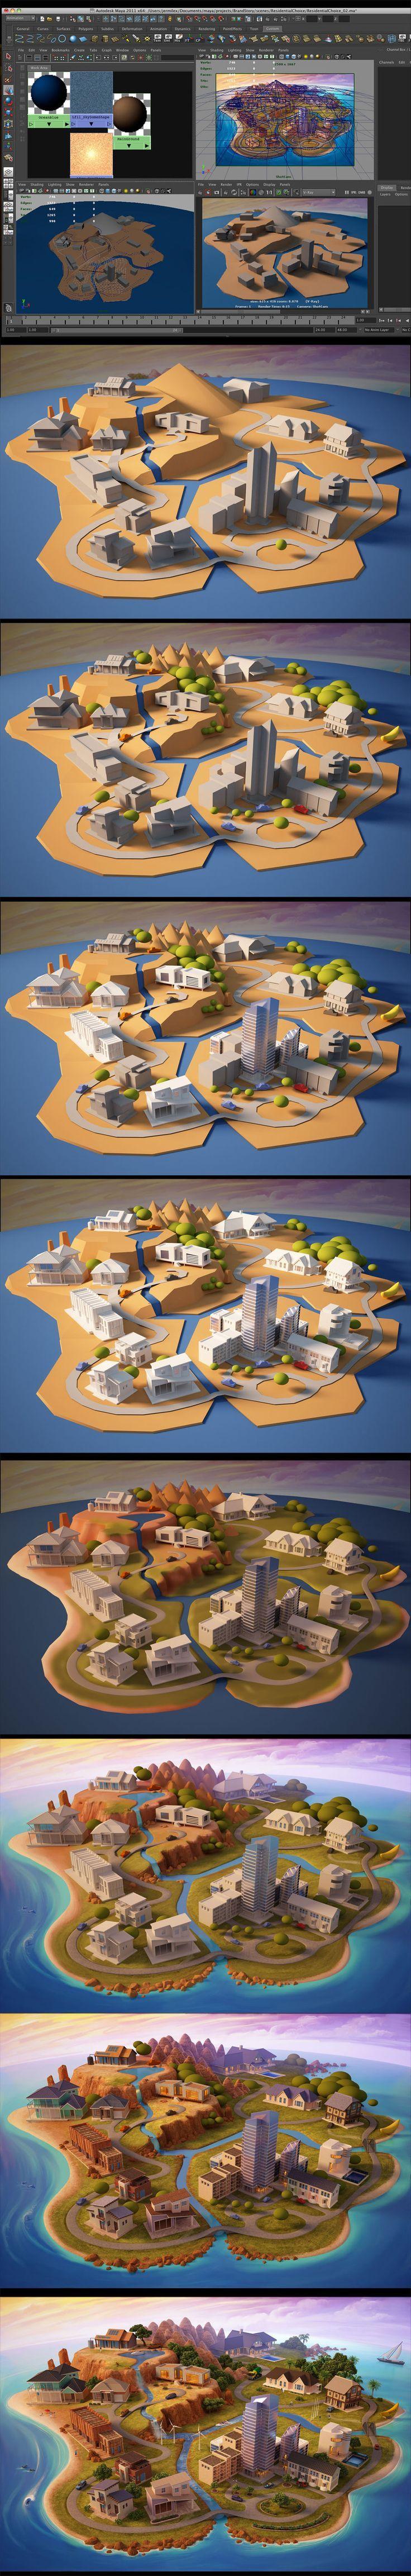 Res Choice 3D process by *jermilex on deviantART - 3D Typography Design Modelling